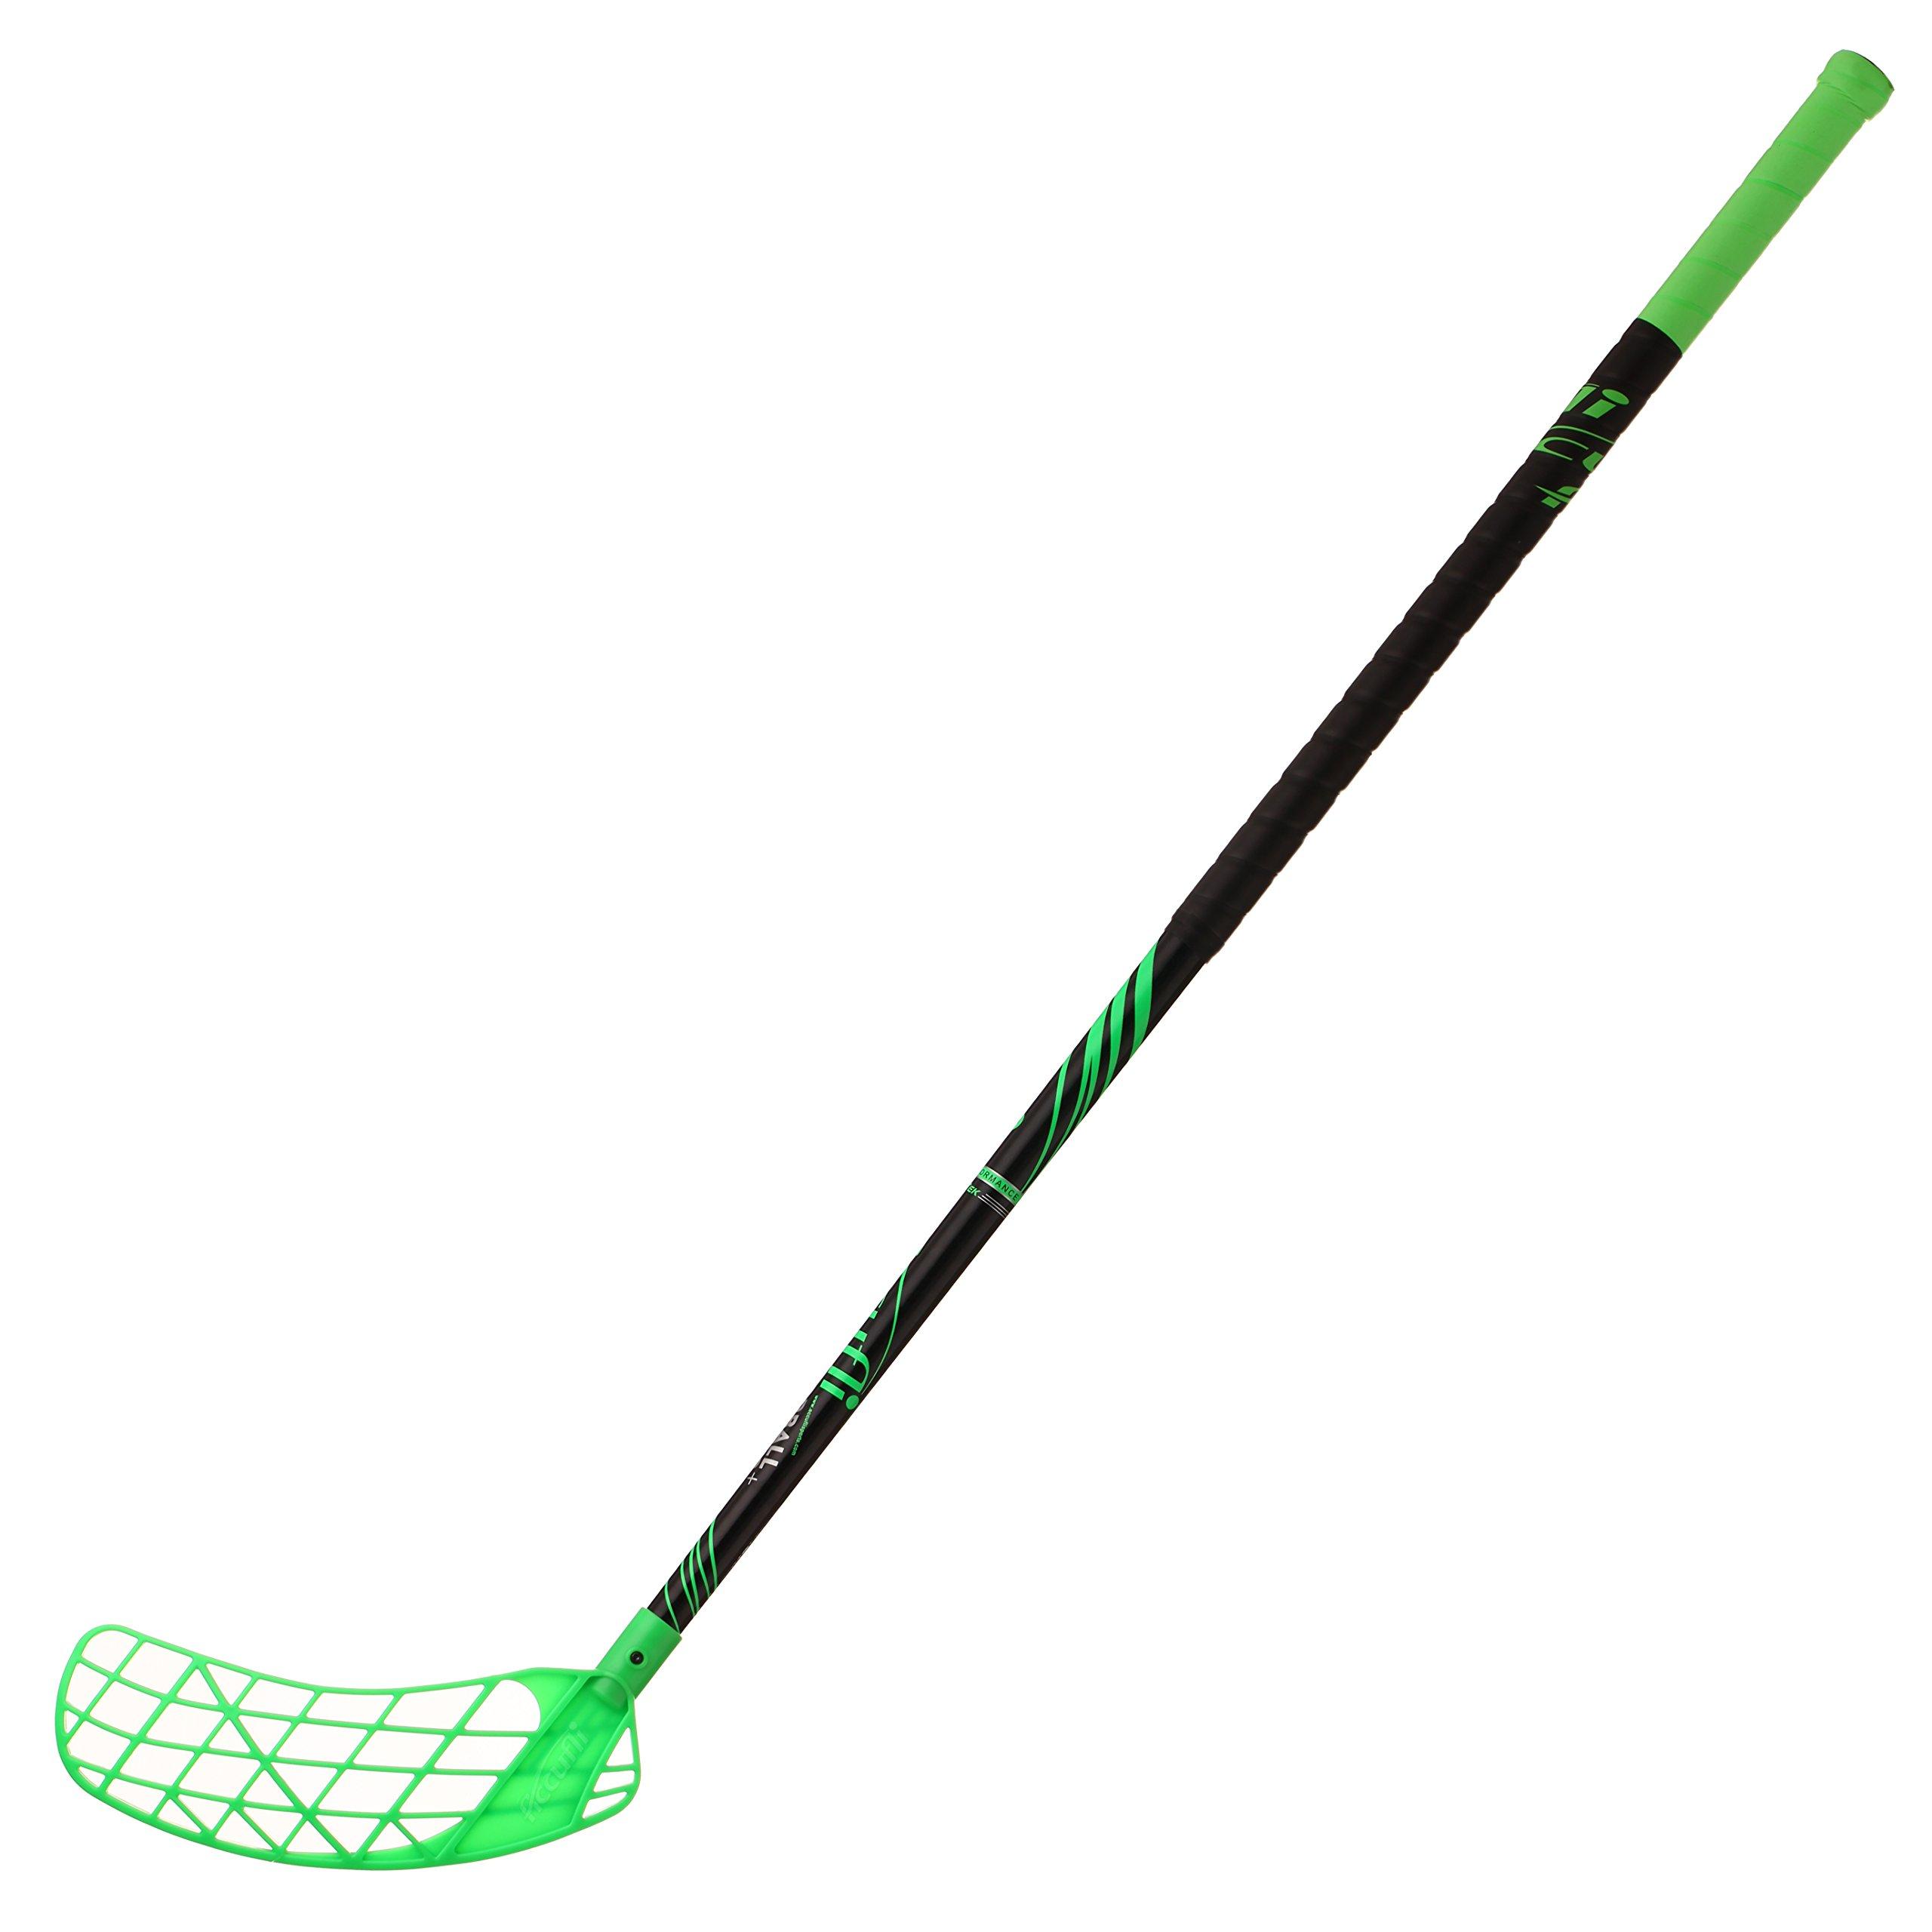 ACCUFLI Floorball Stick AirTek A90 Left 40inch Curved Blade (Green)